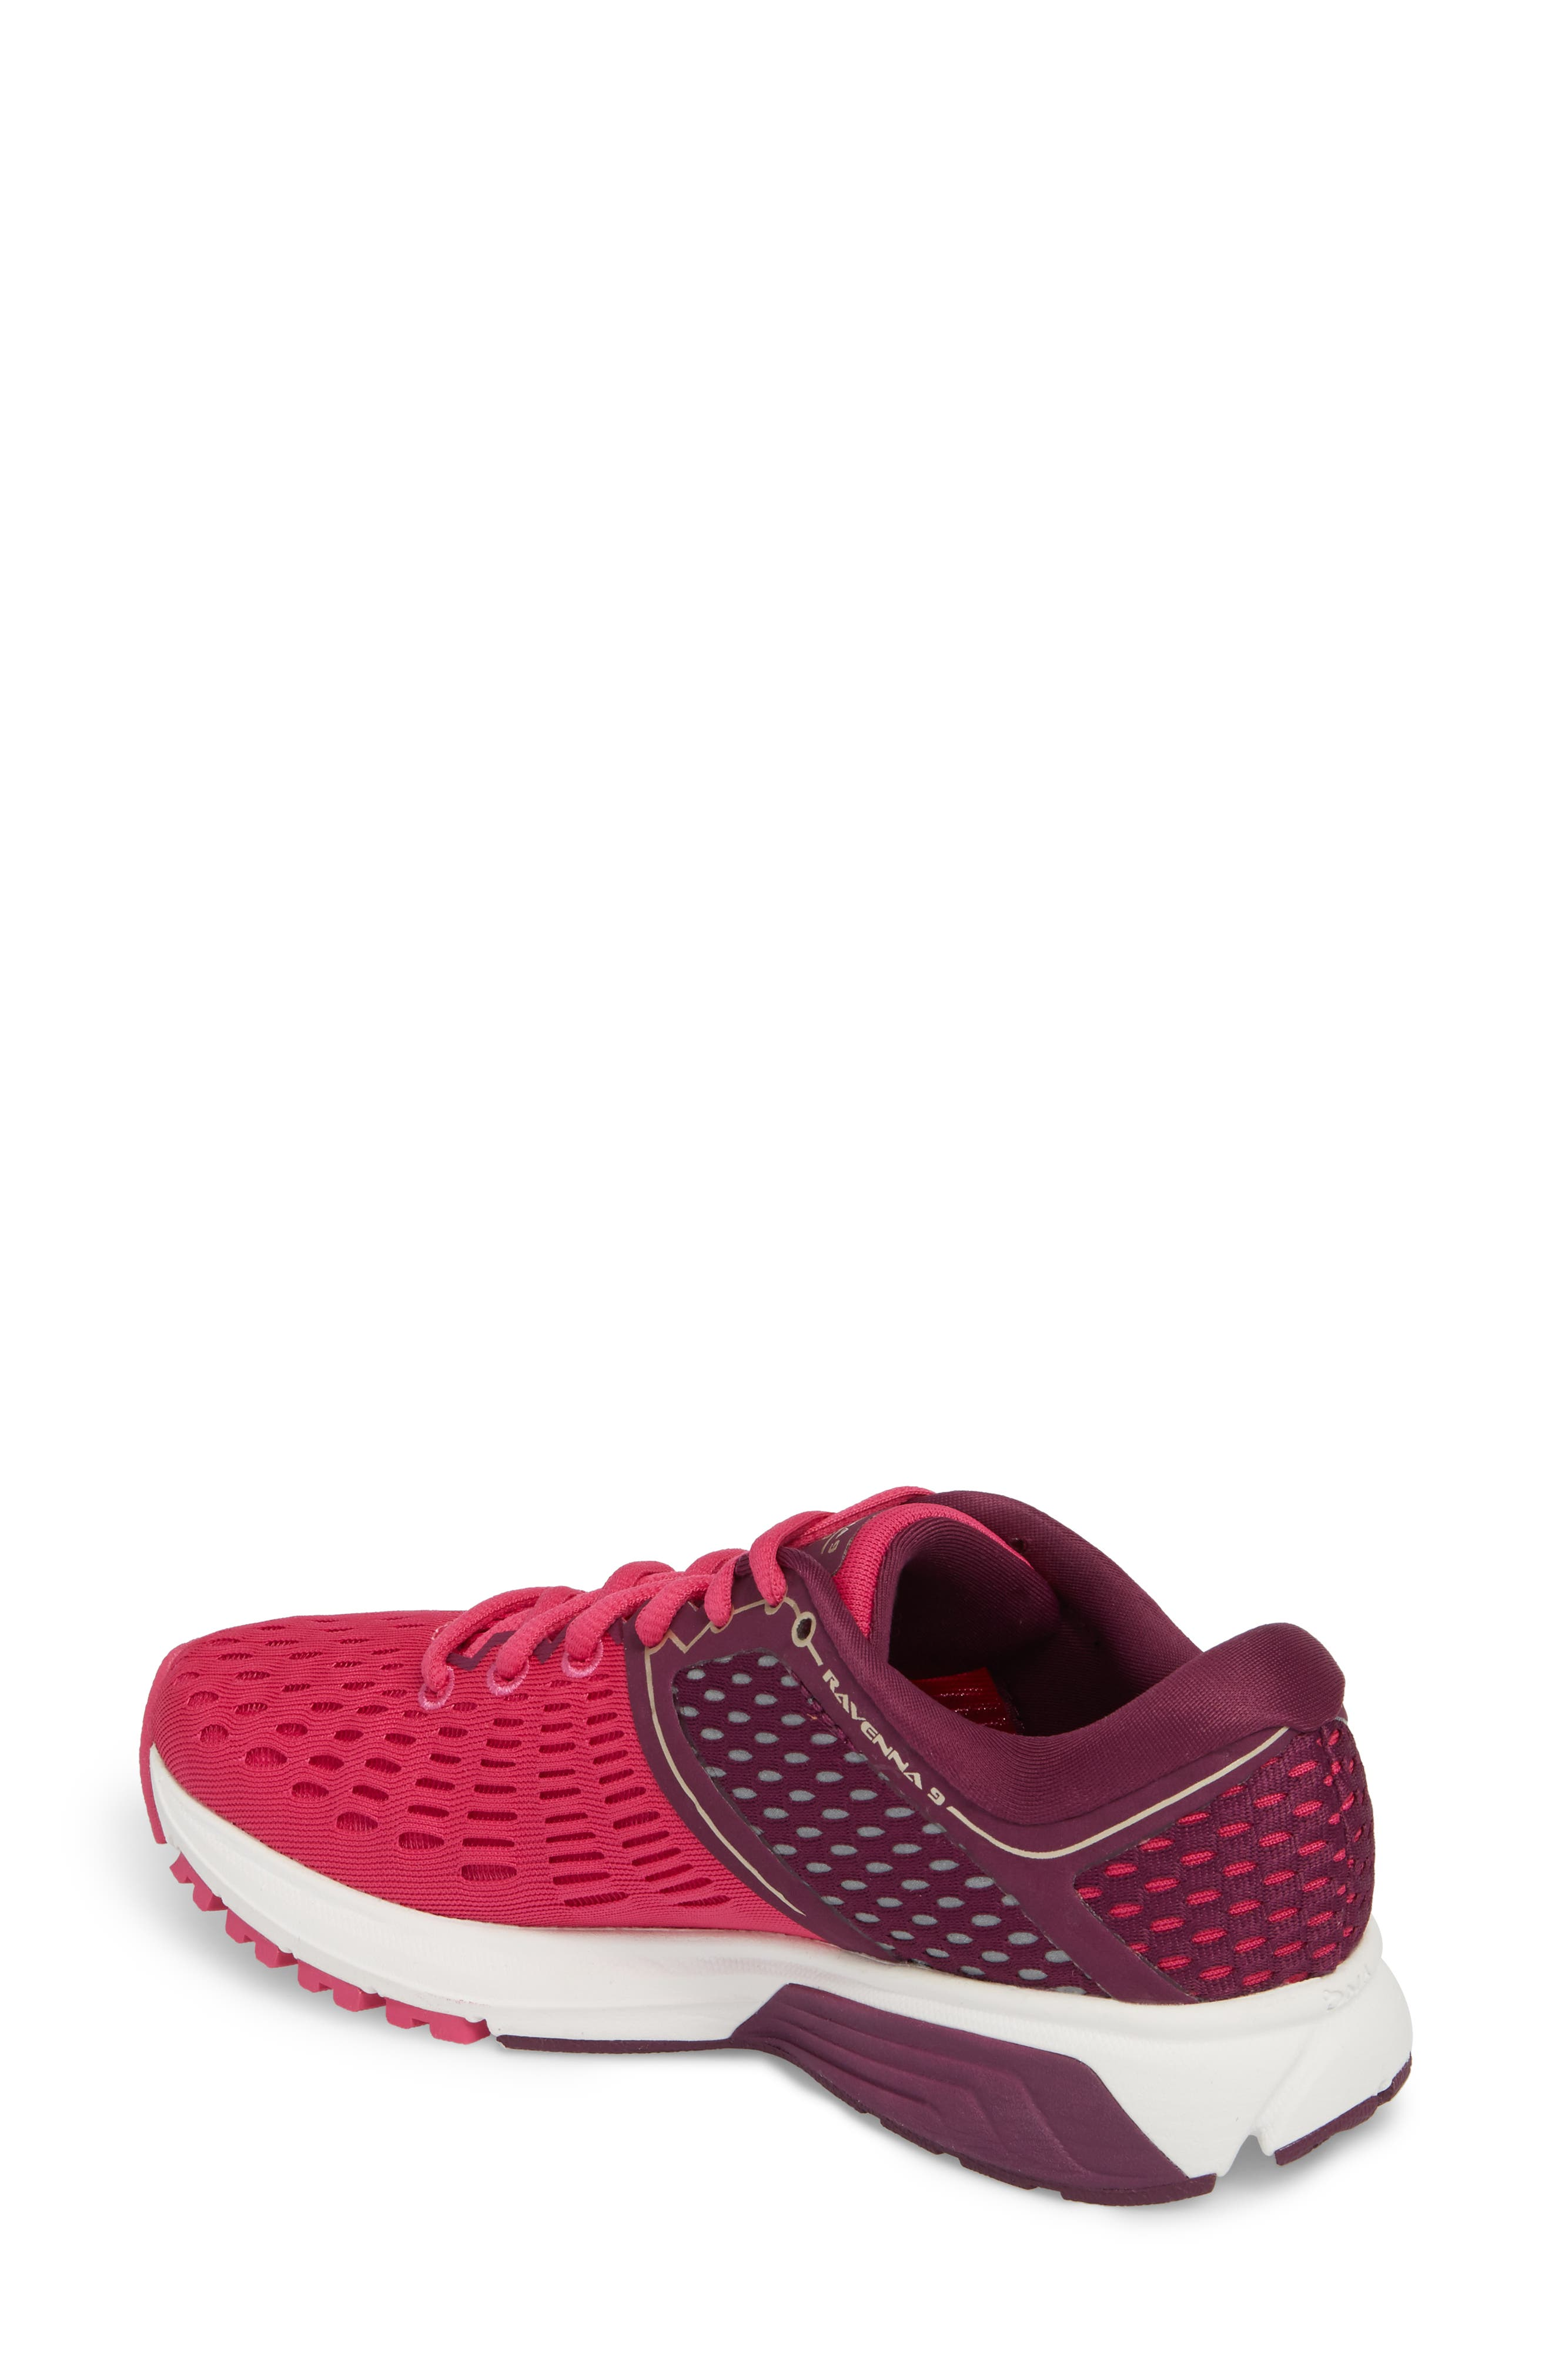 Ravenna 9 Running Shoe,                             Alternate thumbnail 2, color,                             Pink/ Plum/ Champagne